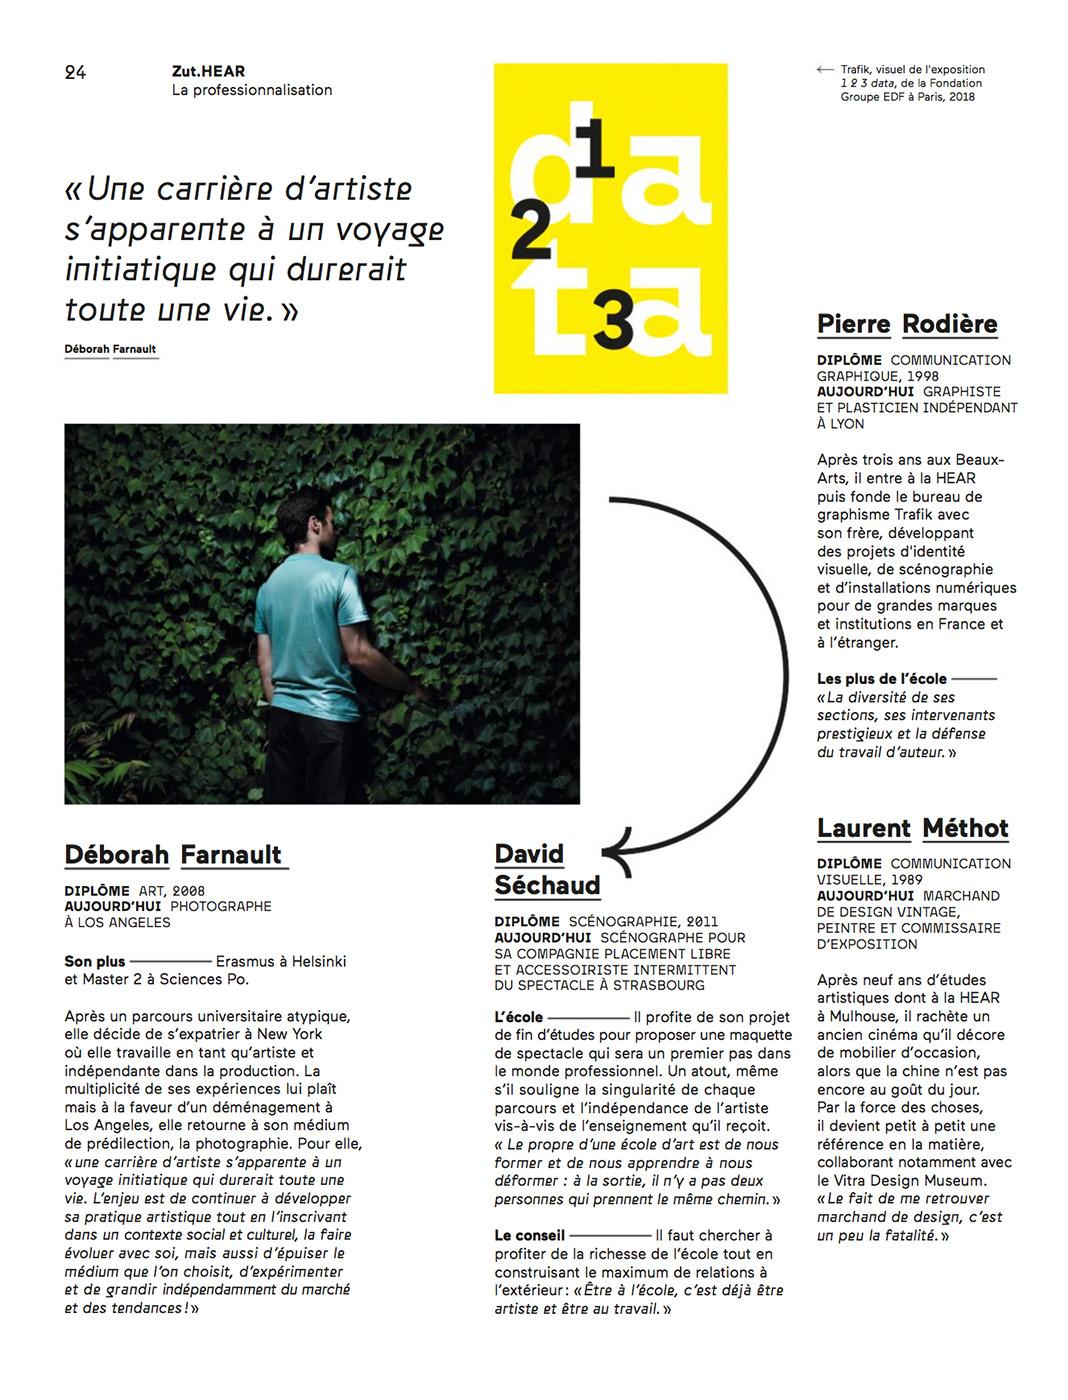 Deborah_Farnault_Zut_Magazine_HEAR_2018_Article_03.jpg